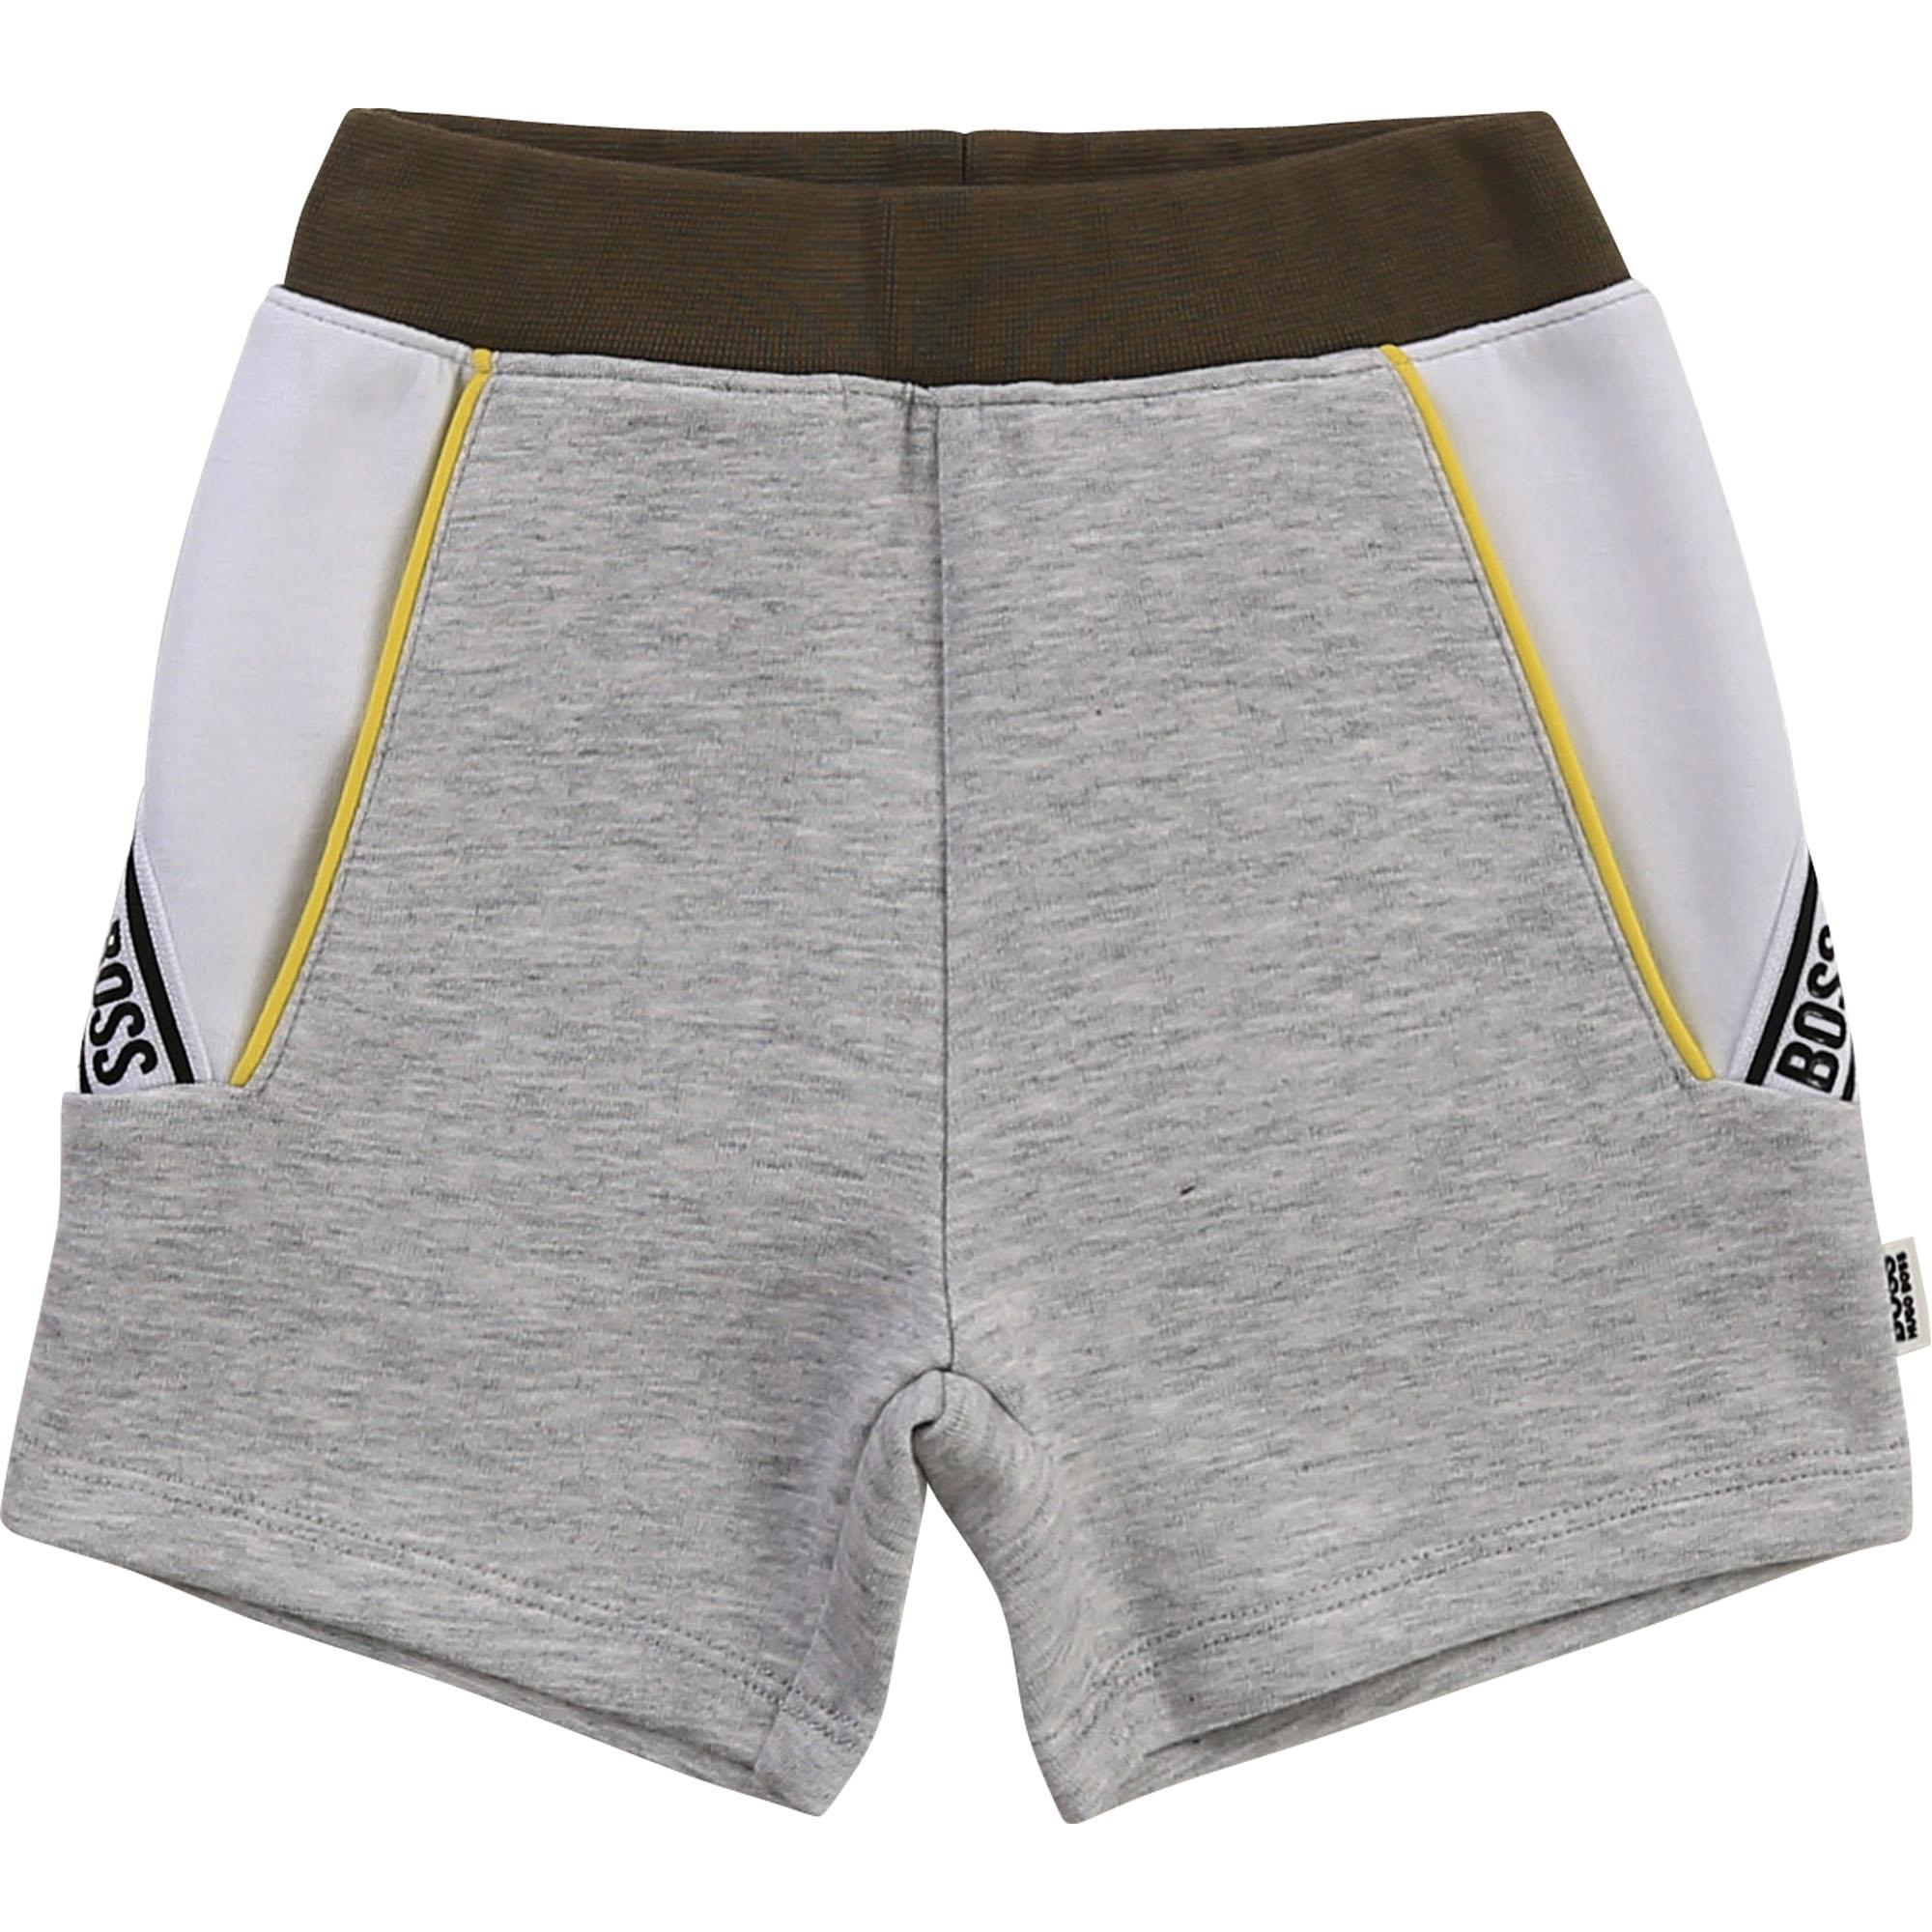 Jersey Bermuda jogging shorts BOSS for BOY